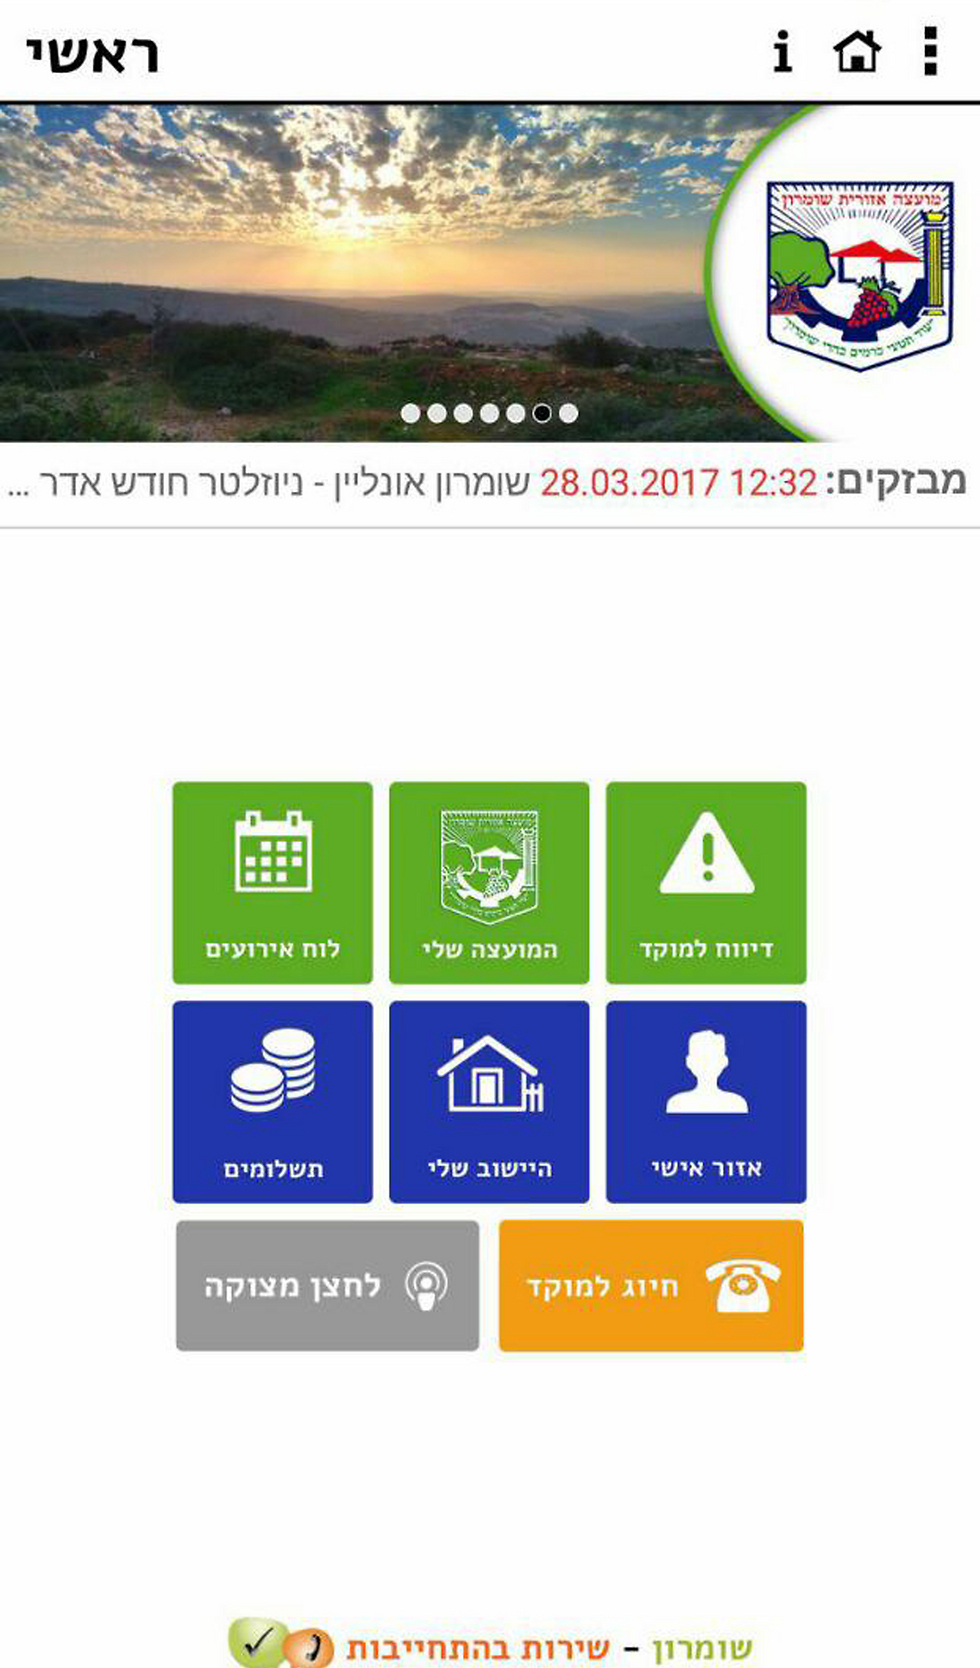 The new app (Photo: Samaria Regional Council)